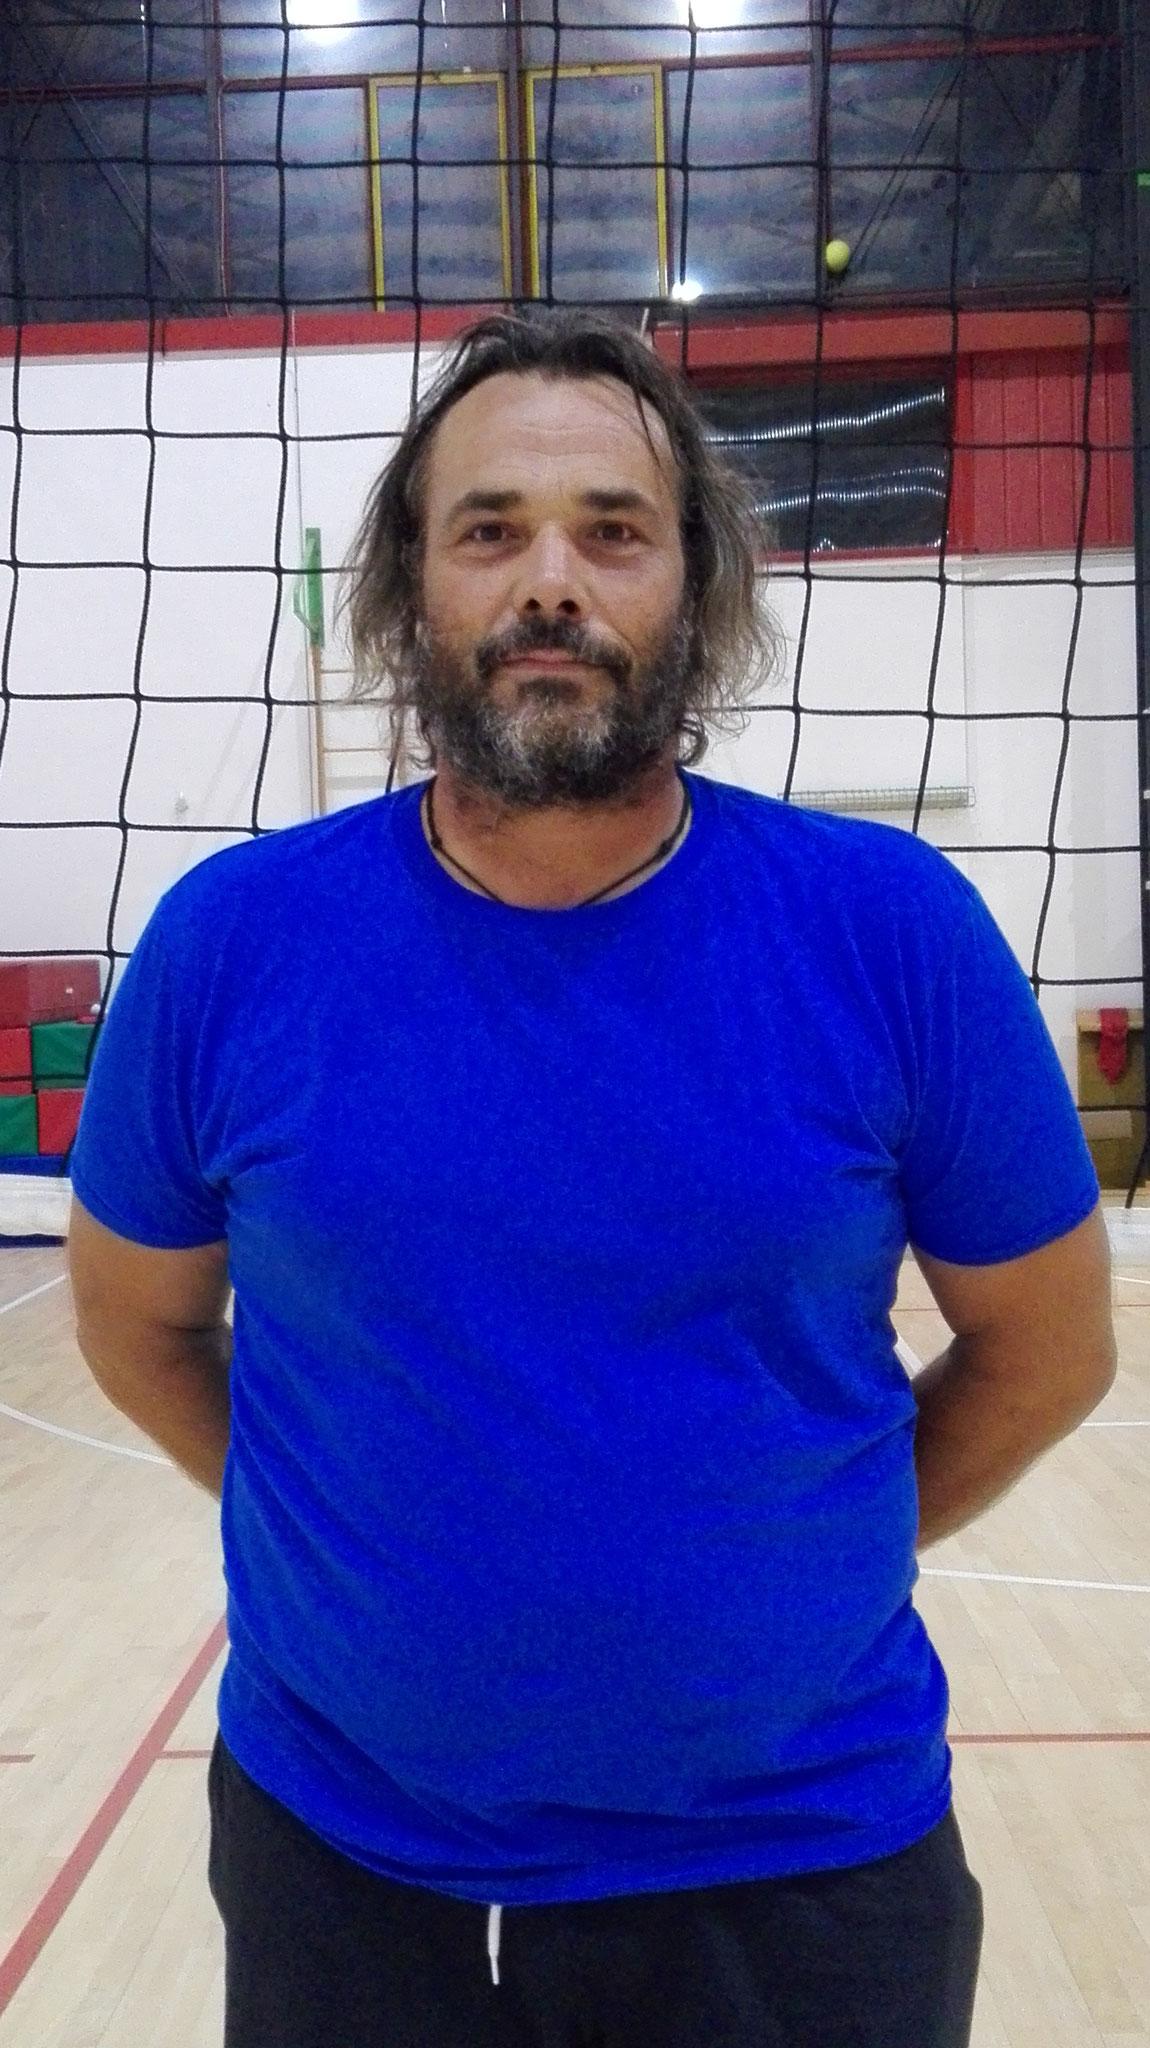 Paolo Franco